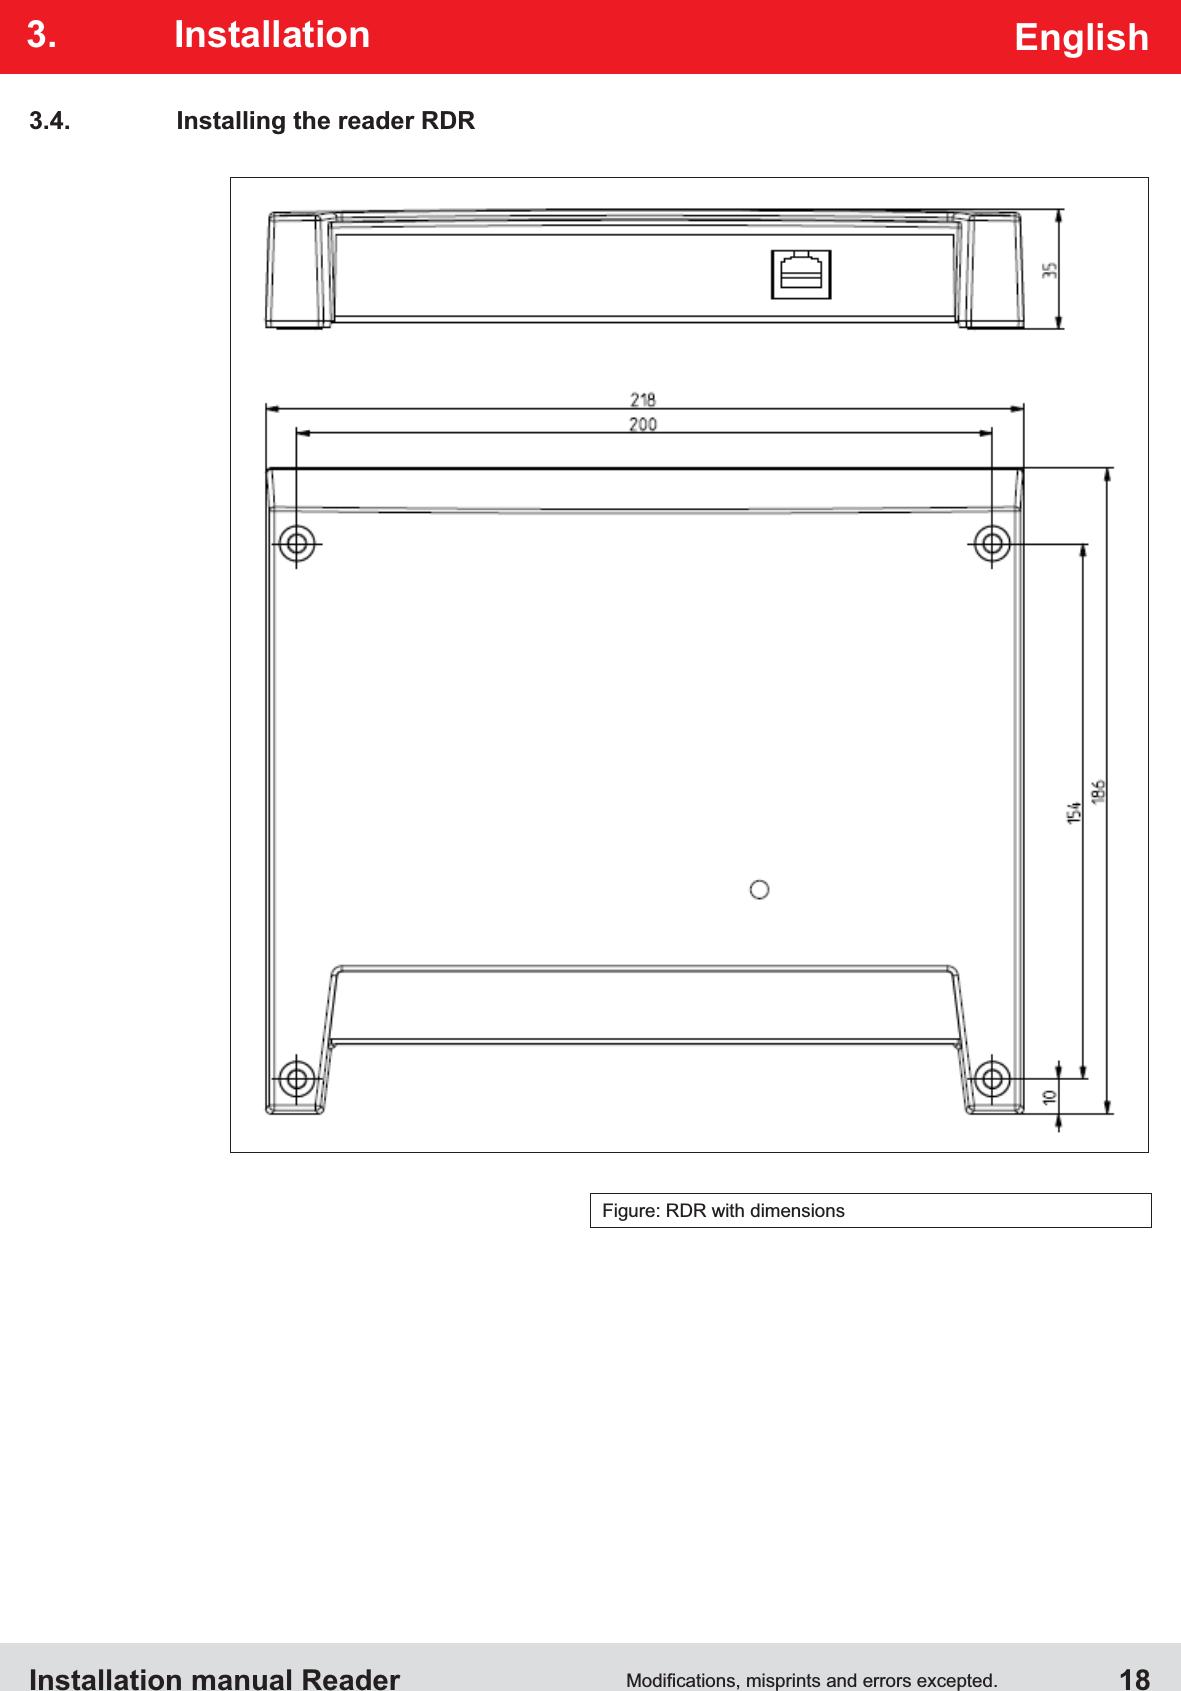 Installation manual Reader  18EnglishFigure: RDR with dimensions3.4.  Installing the reader RDR3. Installation